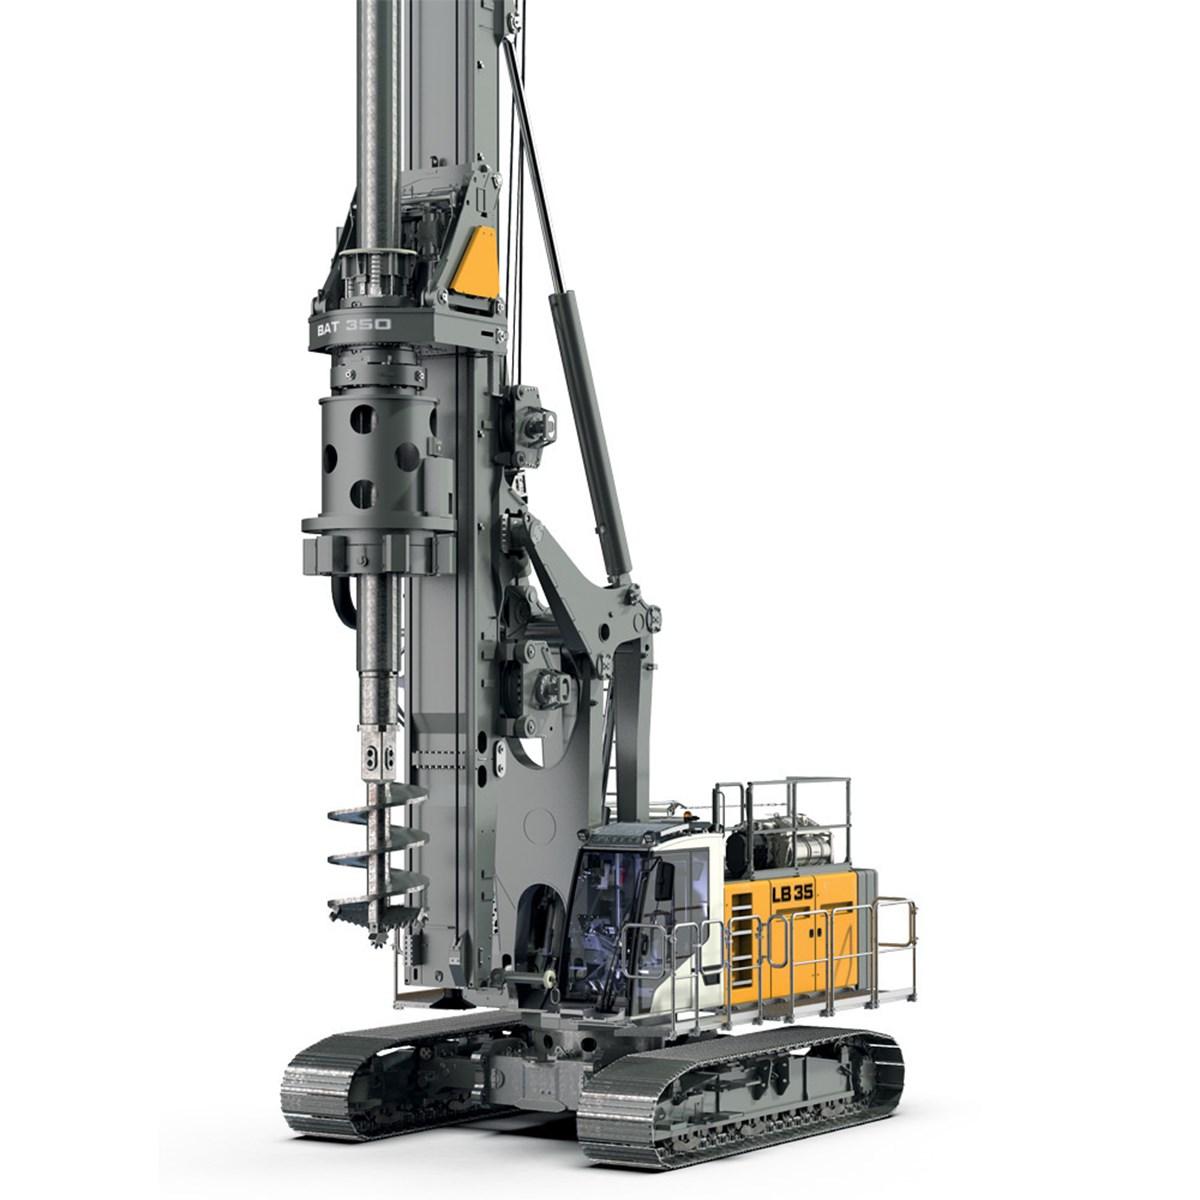 liebherr-bat-350-rotary-drive-bohrantrieb-for-lb-35-drilling-rig.jpg